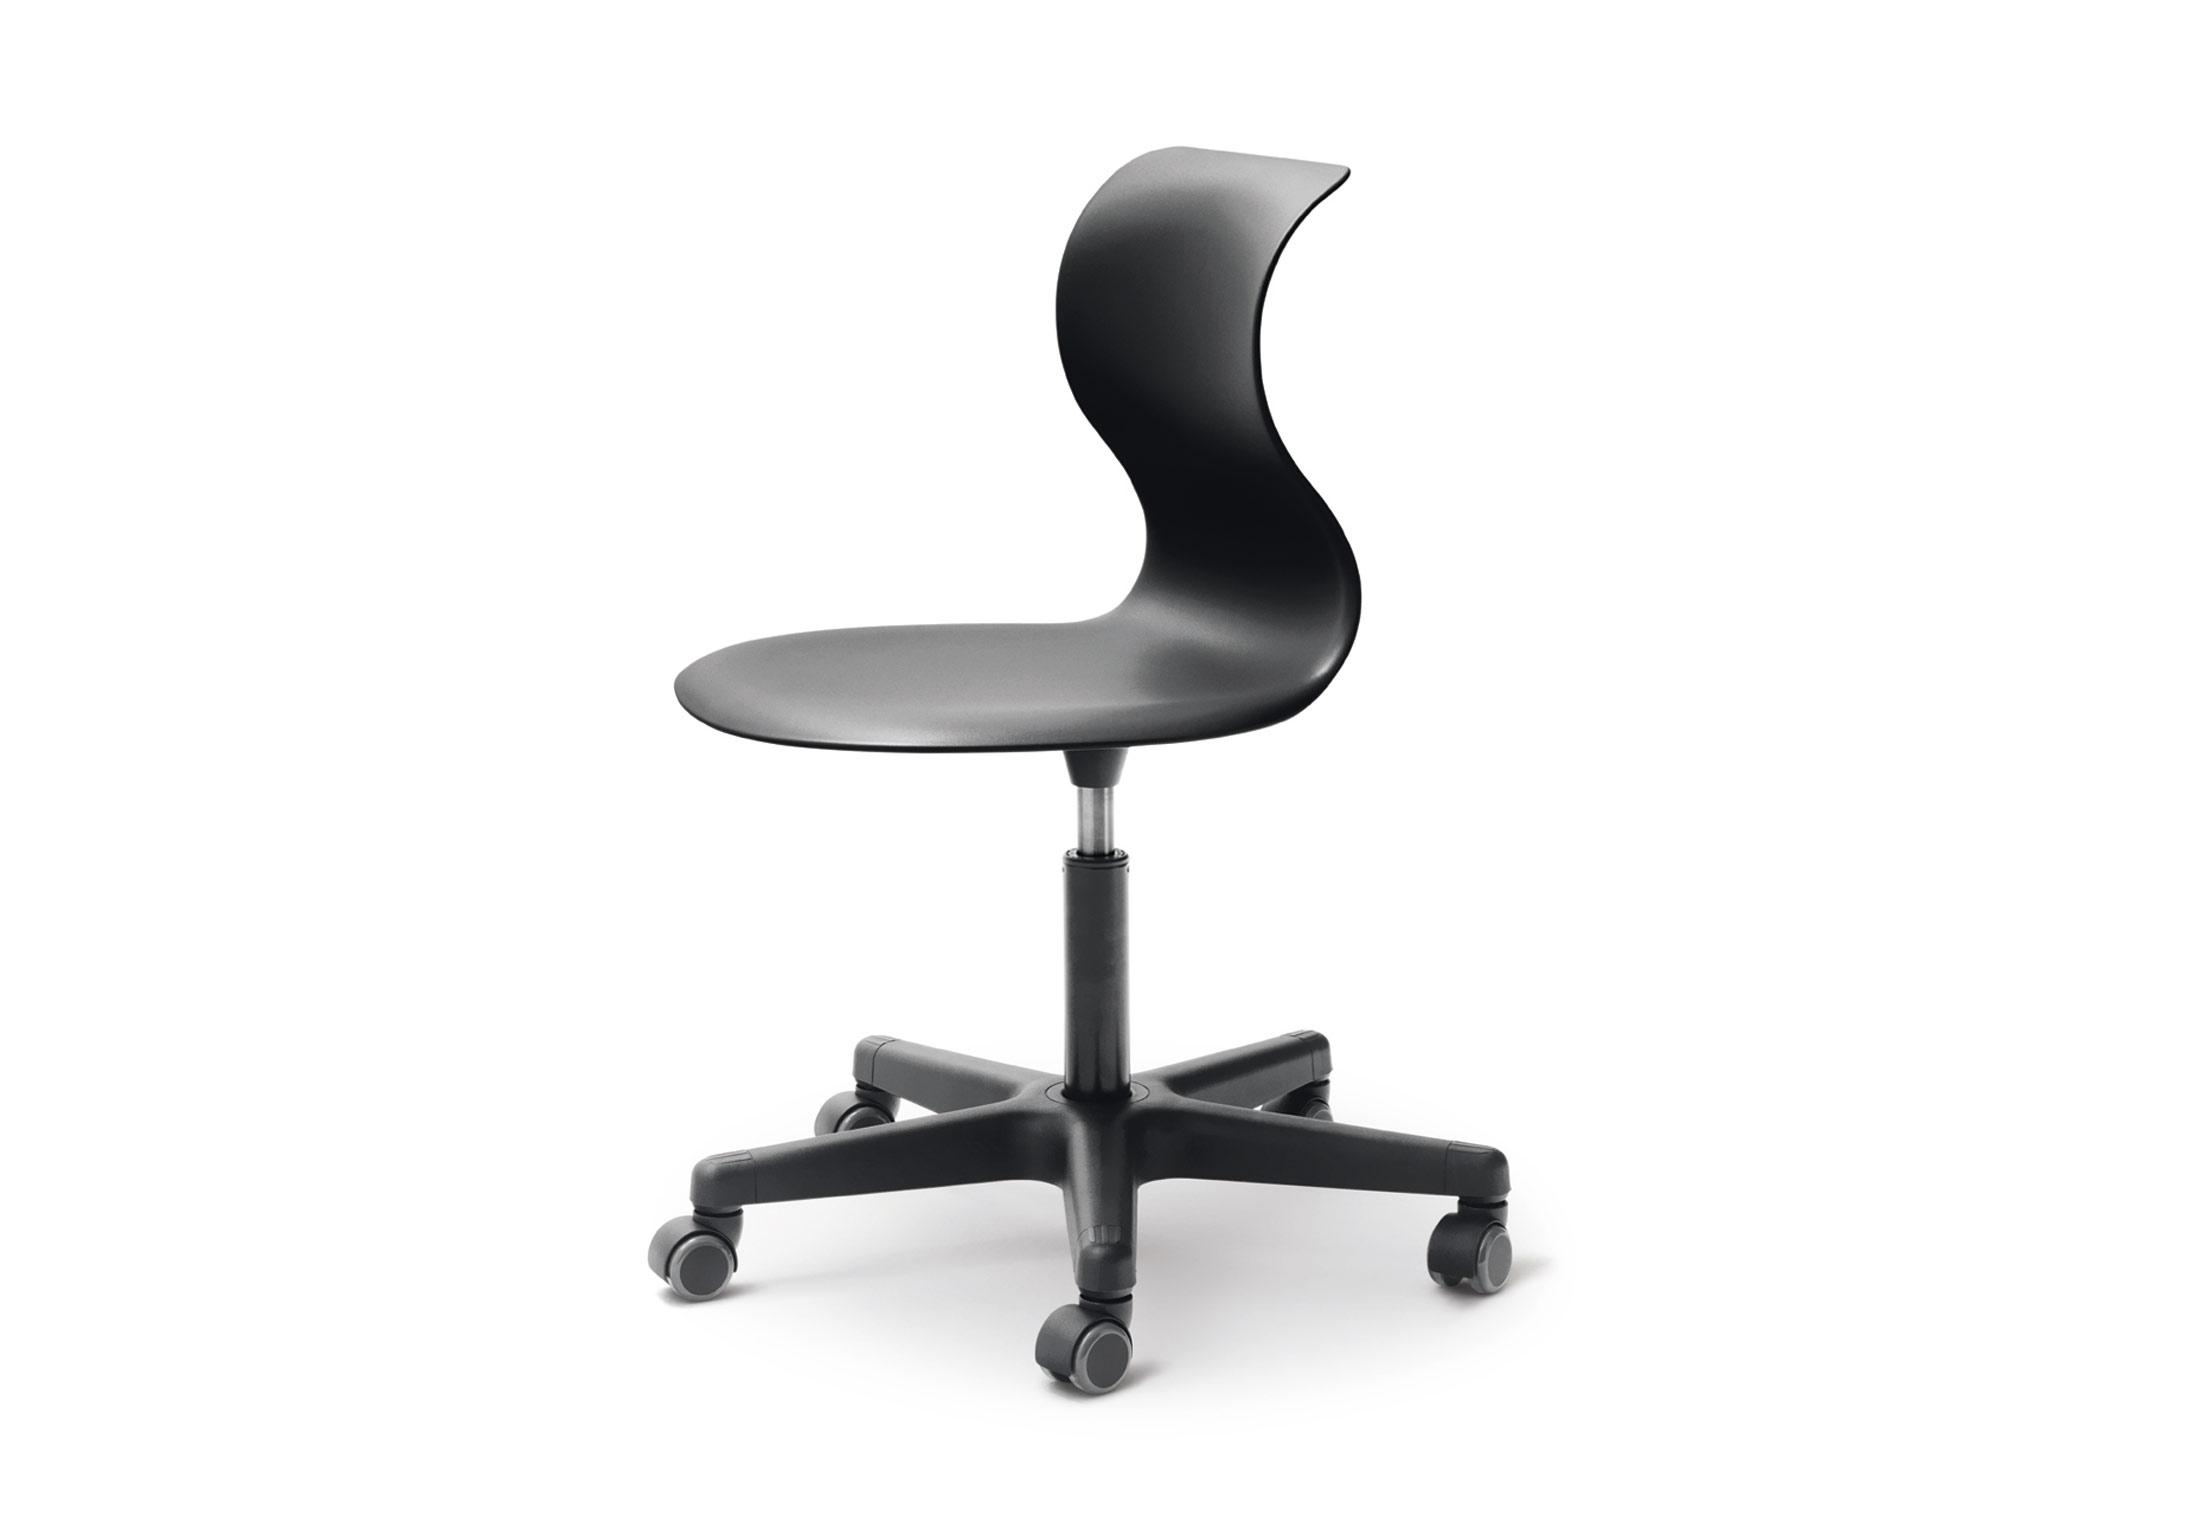 PRO swivel chair by Flötotto